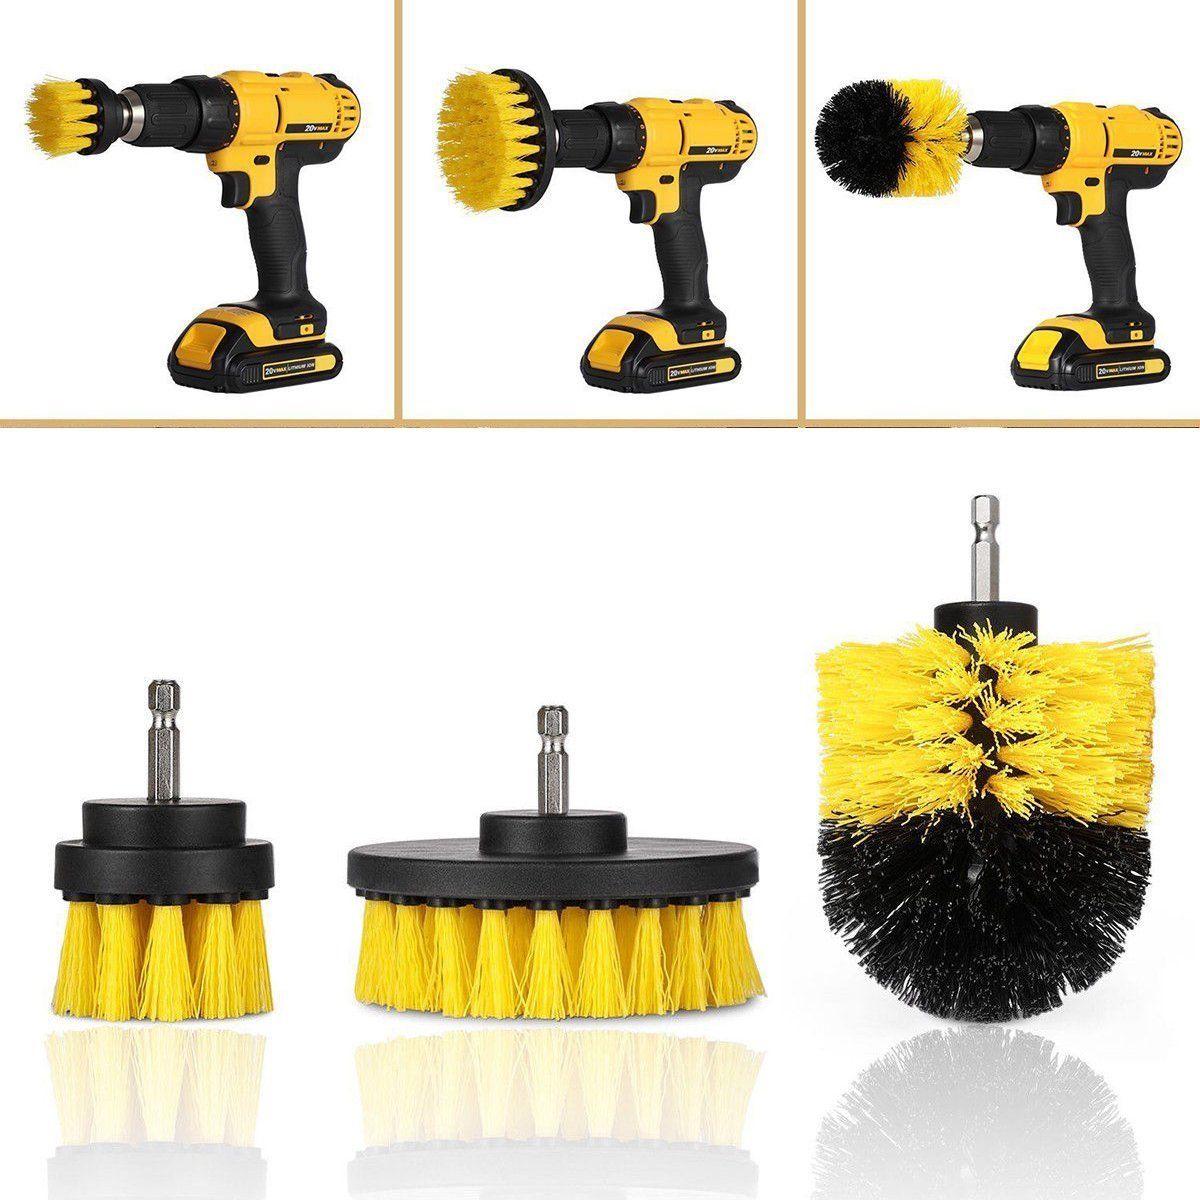 Brush Sensible 3pcs/set Yellow Electric Drill Brush Plastic Round Cleaning Brush For Carpet Glass Car Tires Nylon Brushes Power Scrubber Drill 100% Original